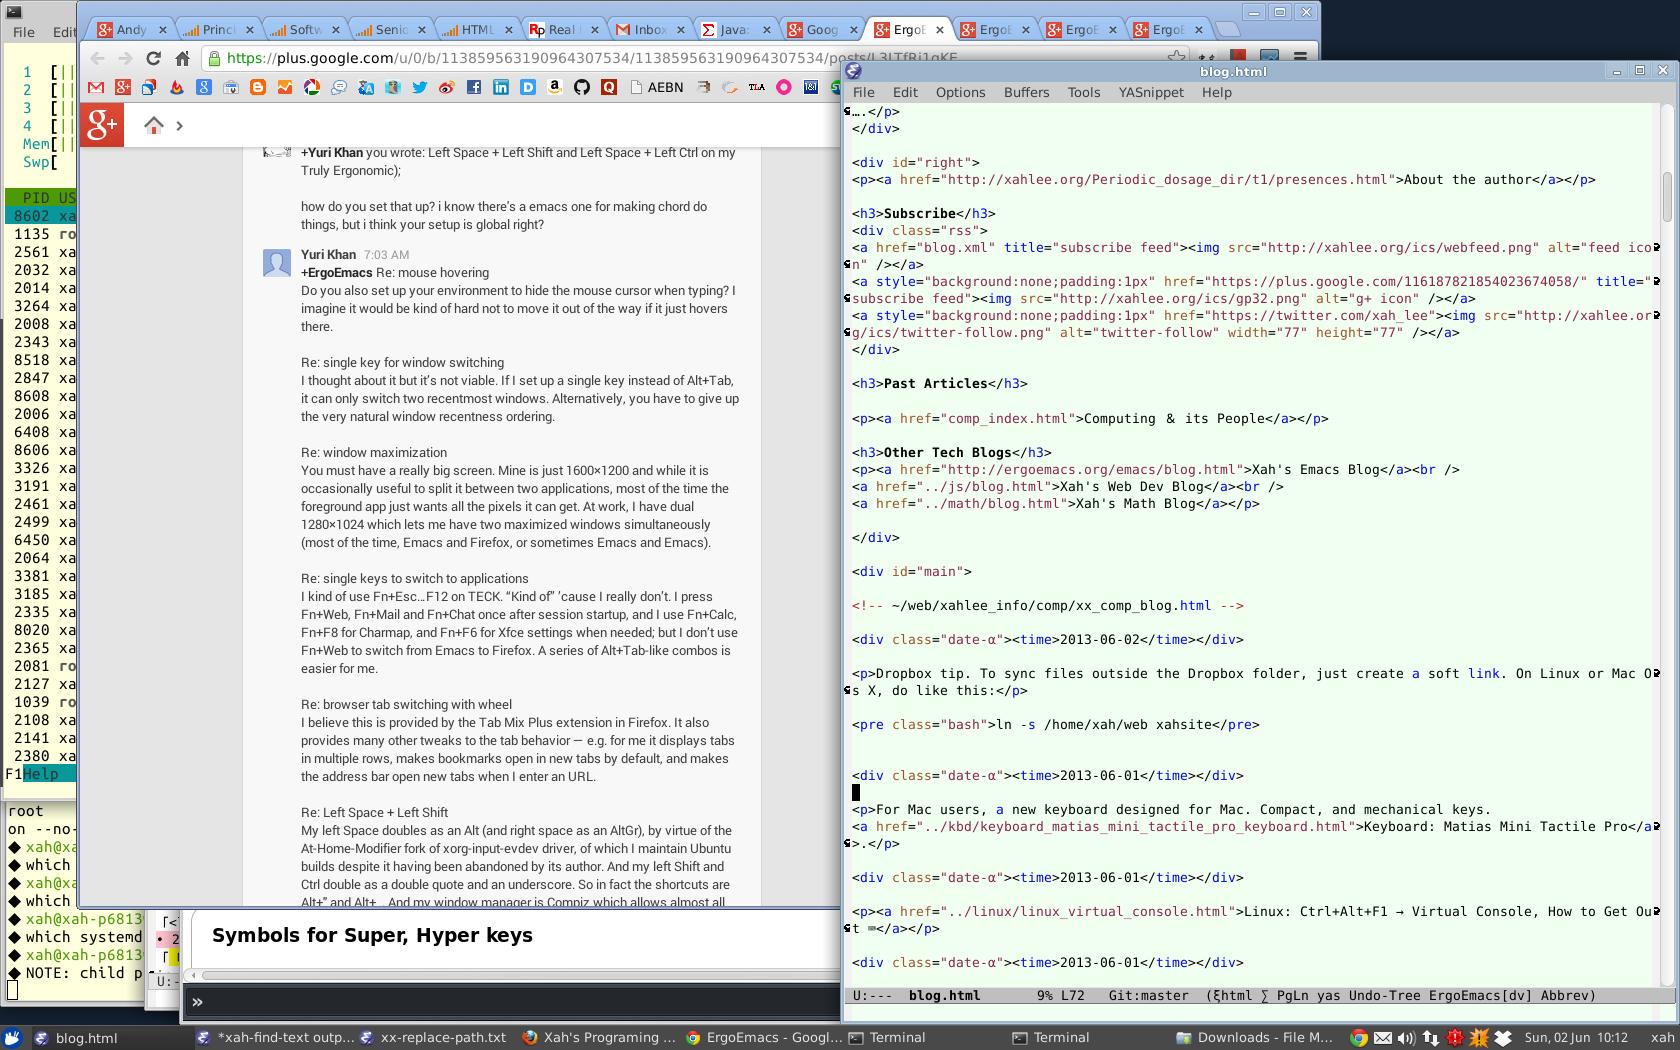 xah linux desktop 2013-06-02